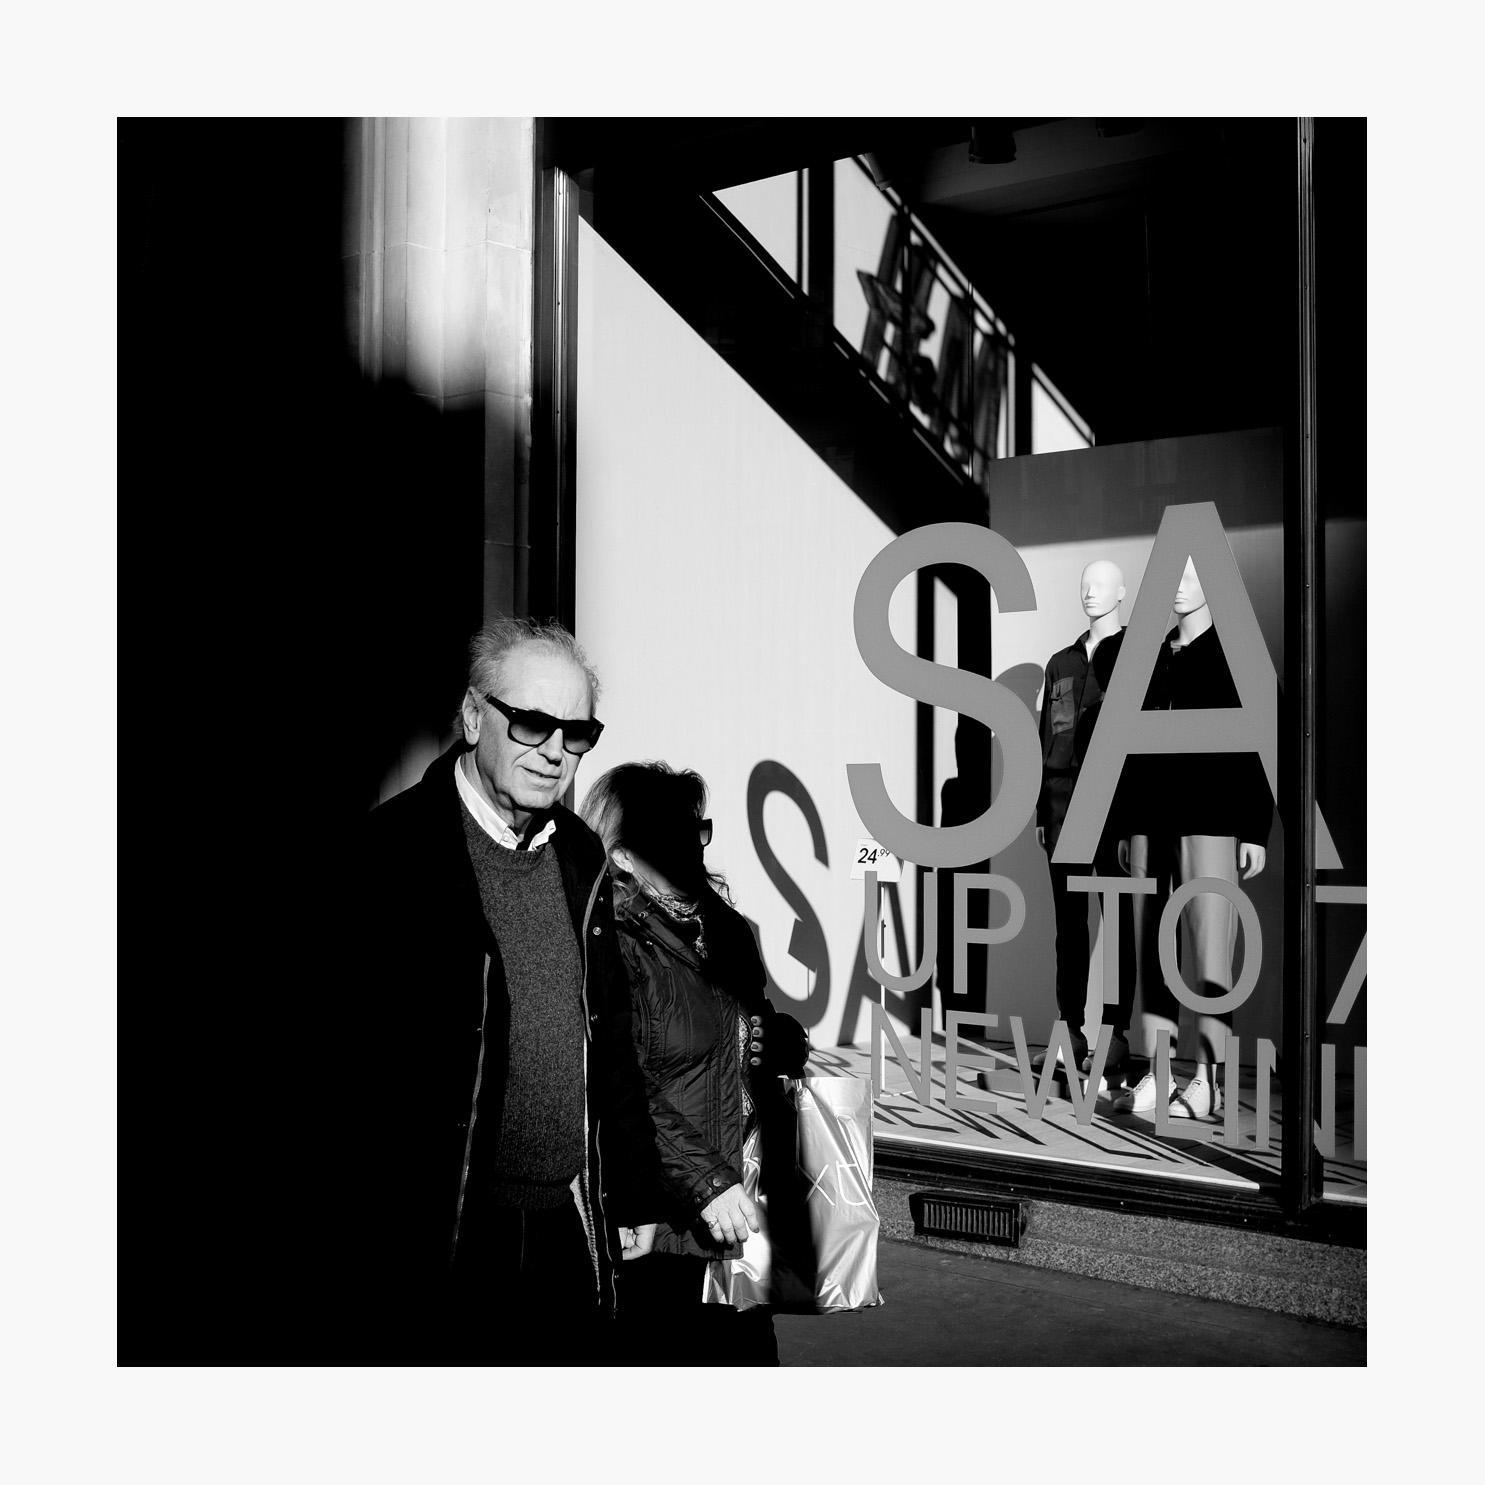 ©-Harry-W-Edmonds-2018-@photographersnote-Street-Sights-Social-PN01.jpg